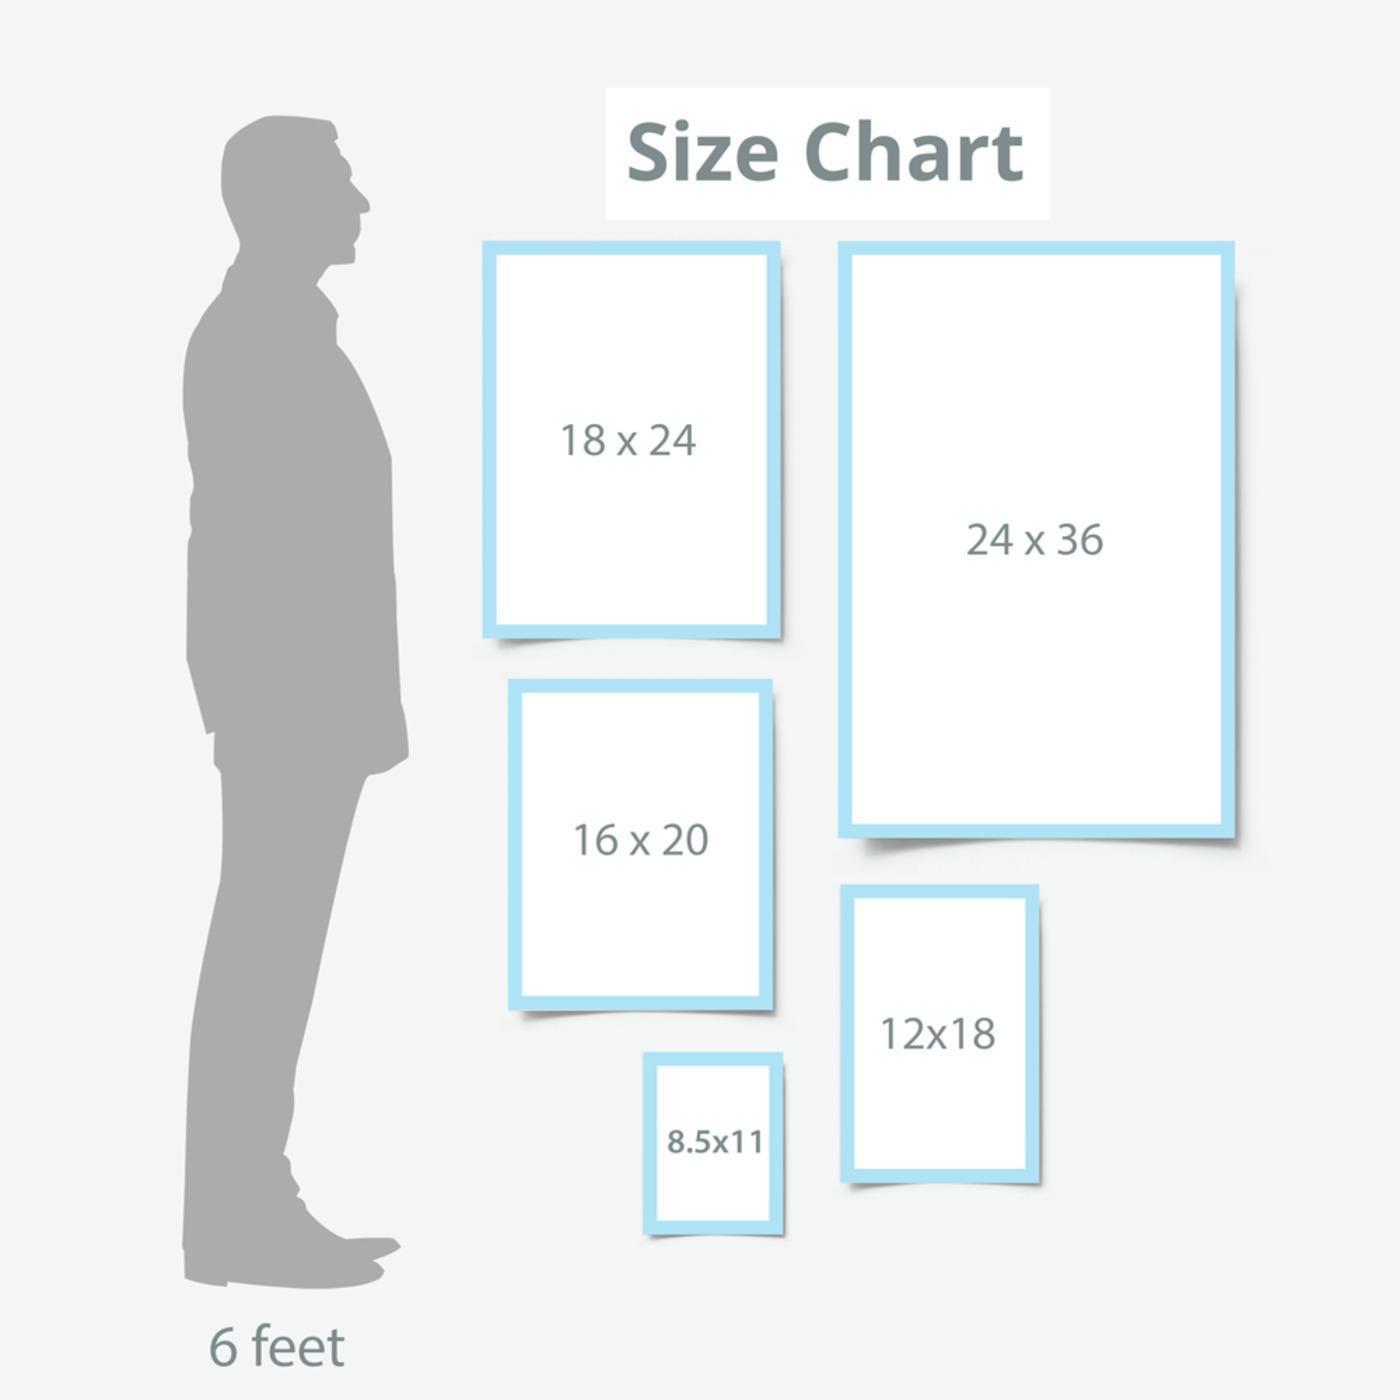 poster size seatledavidjoelco